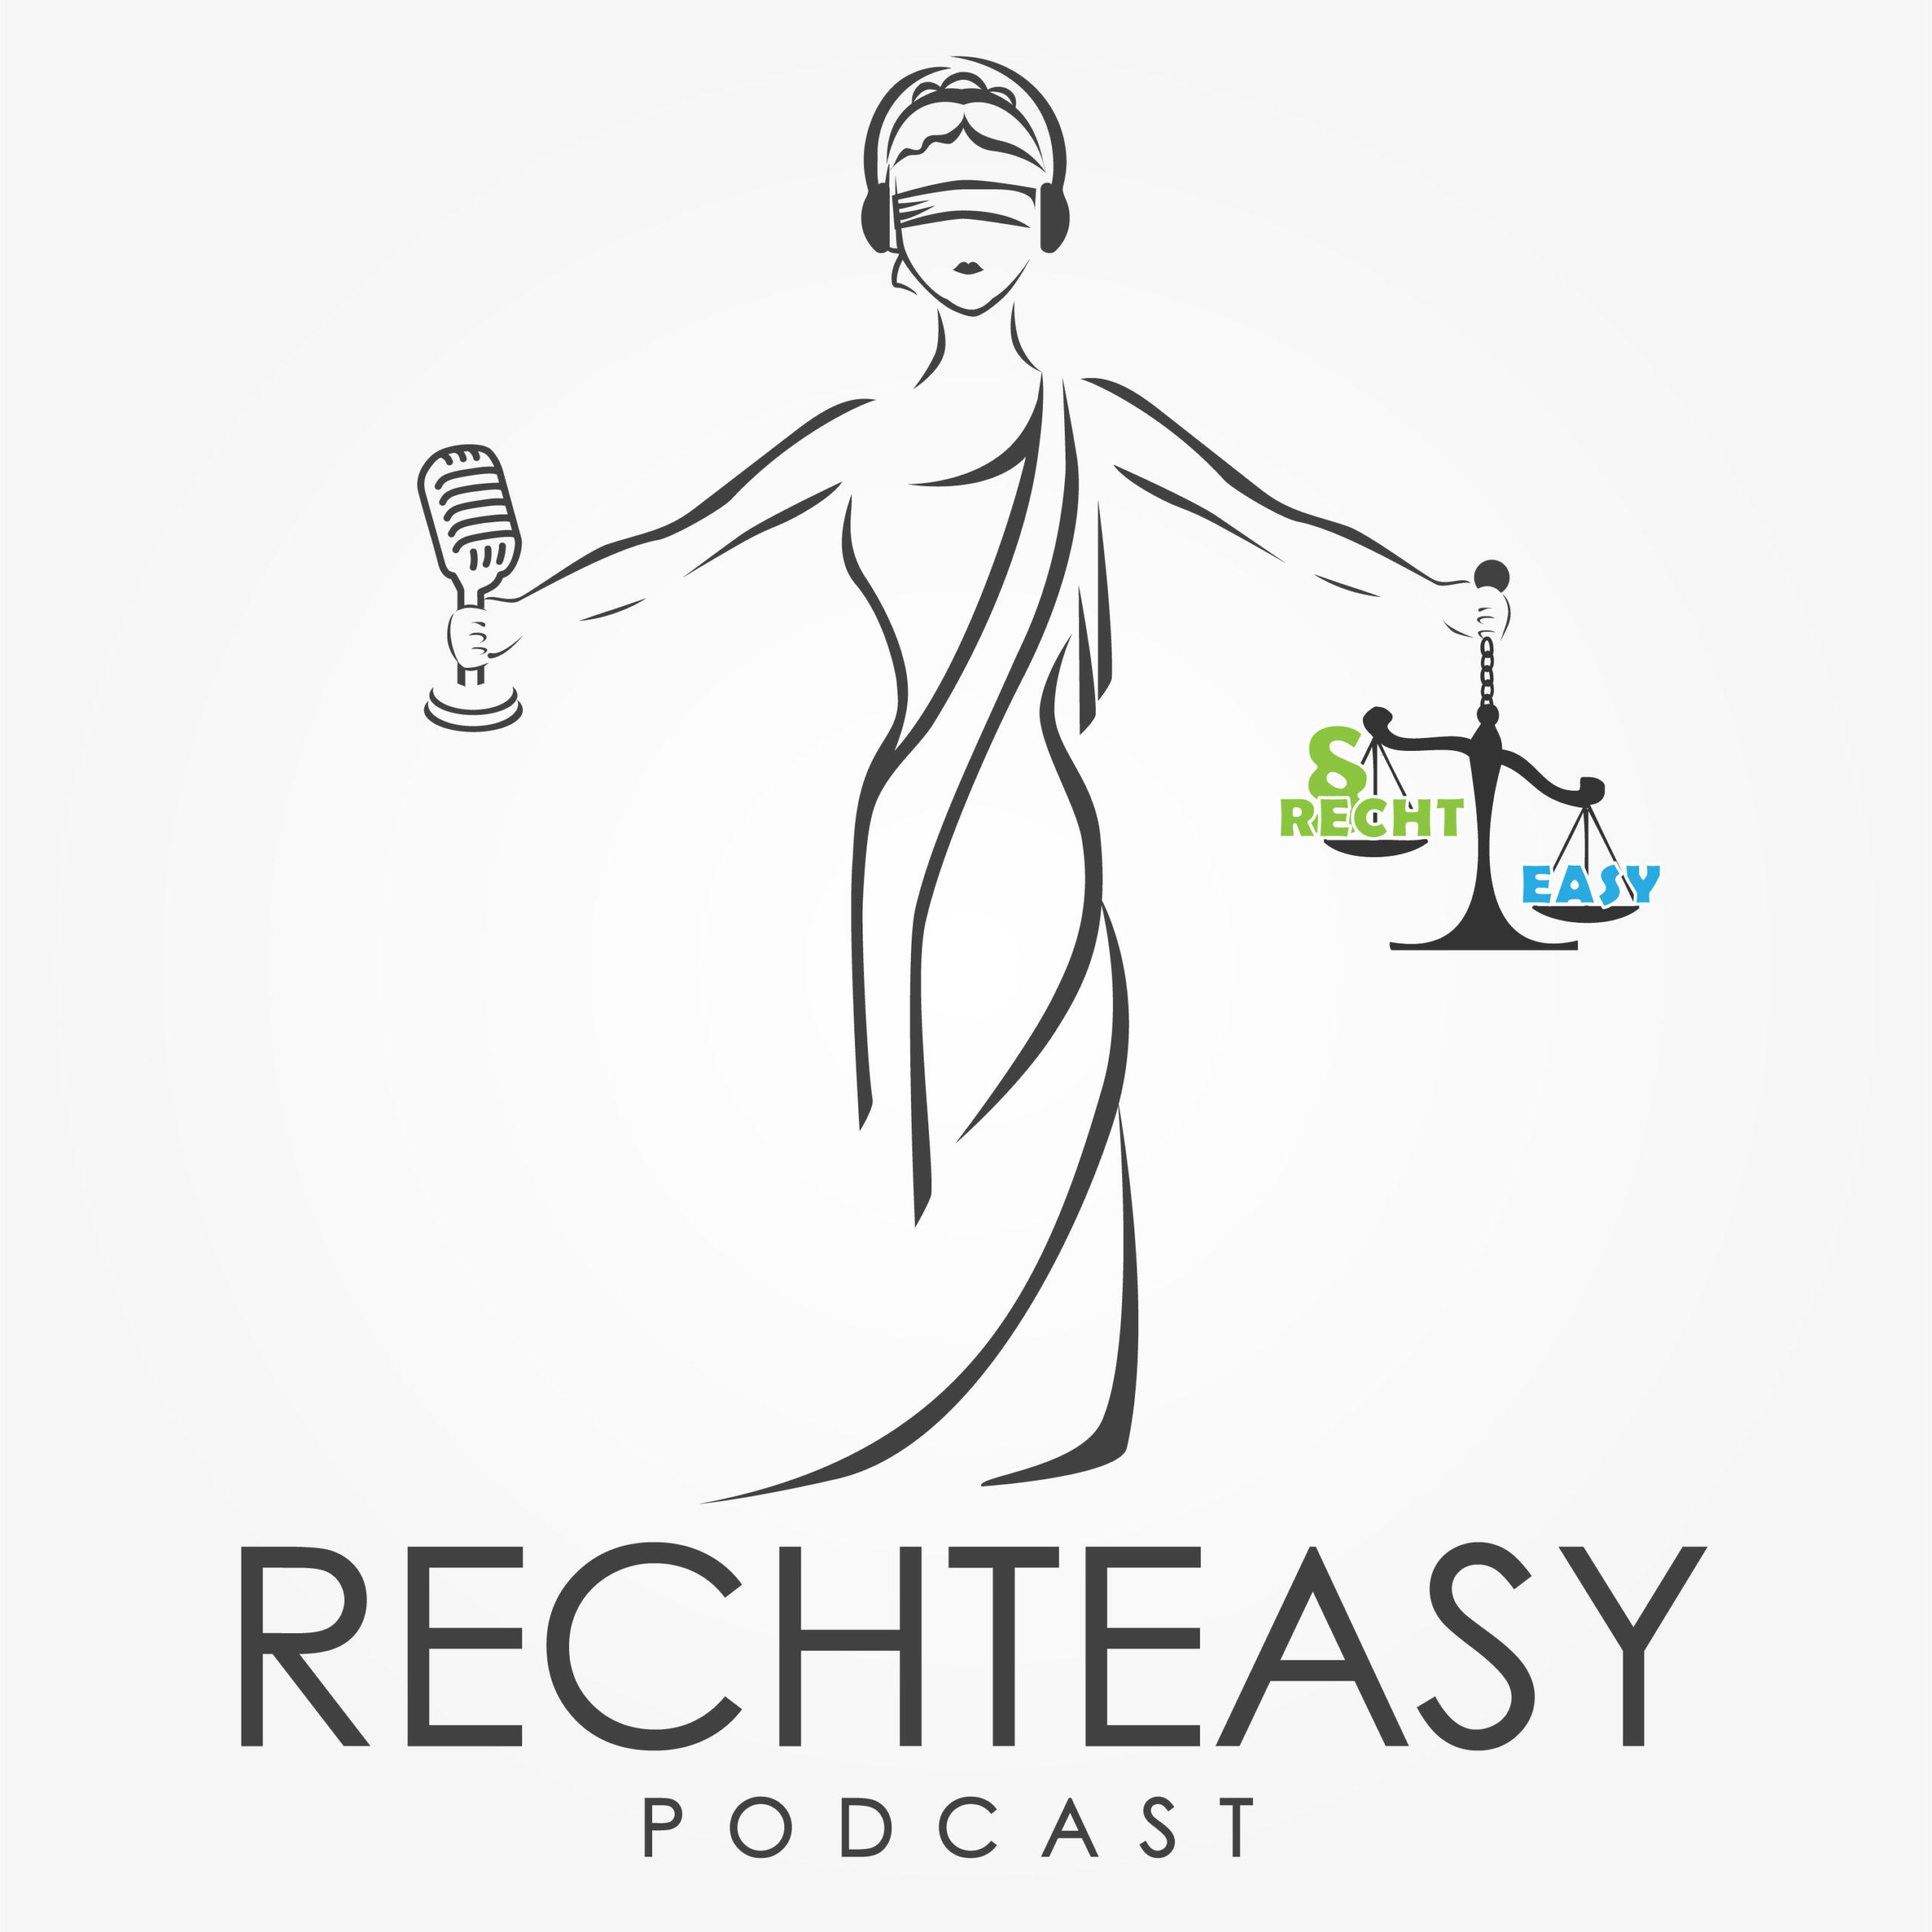 RechtEasy Podcast